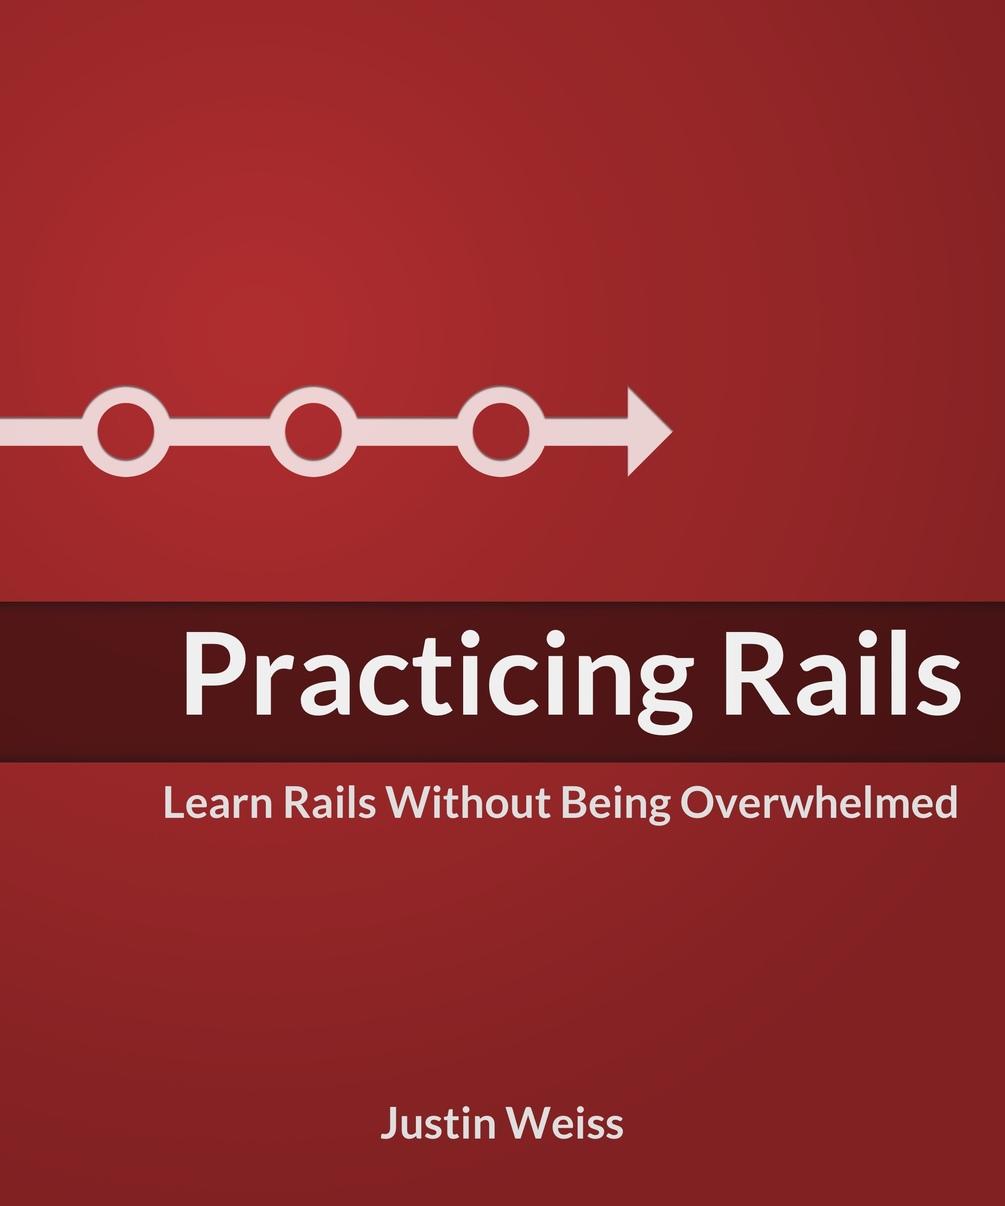 practicing-rails.jpg